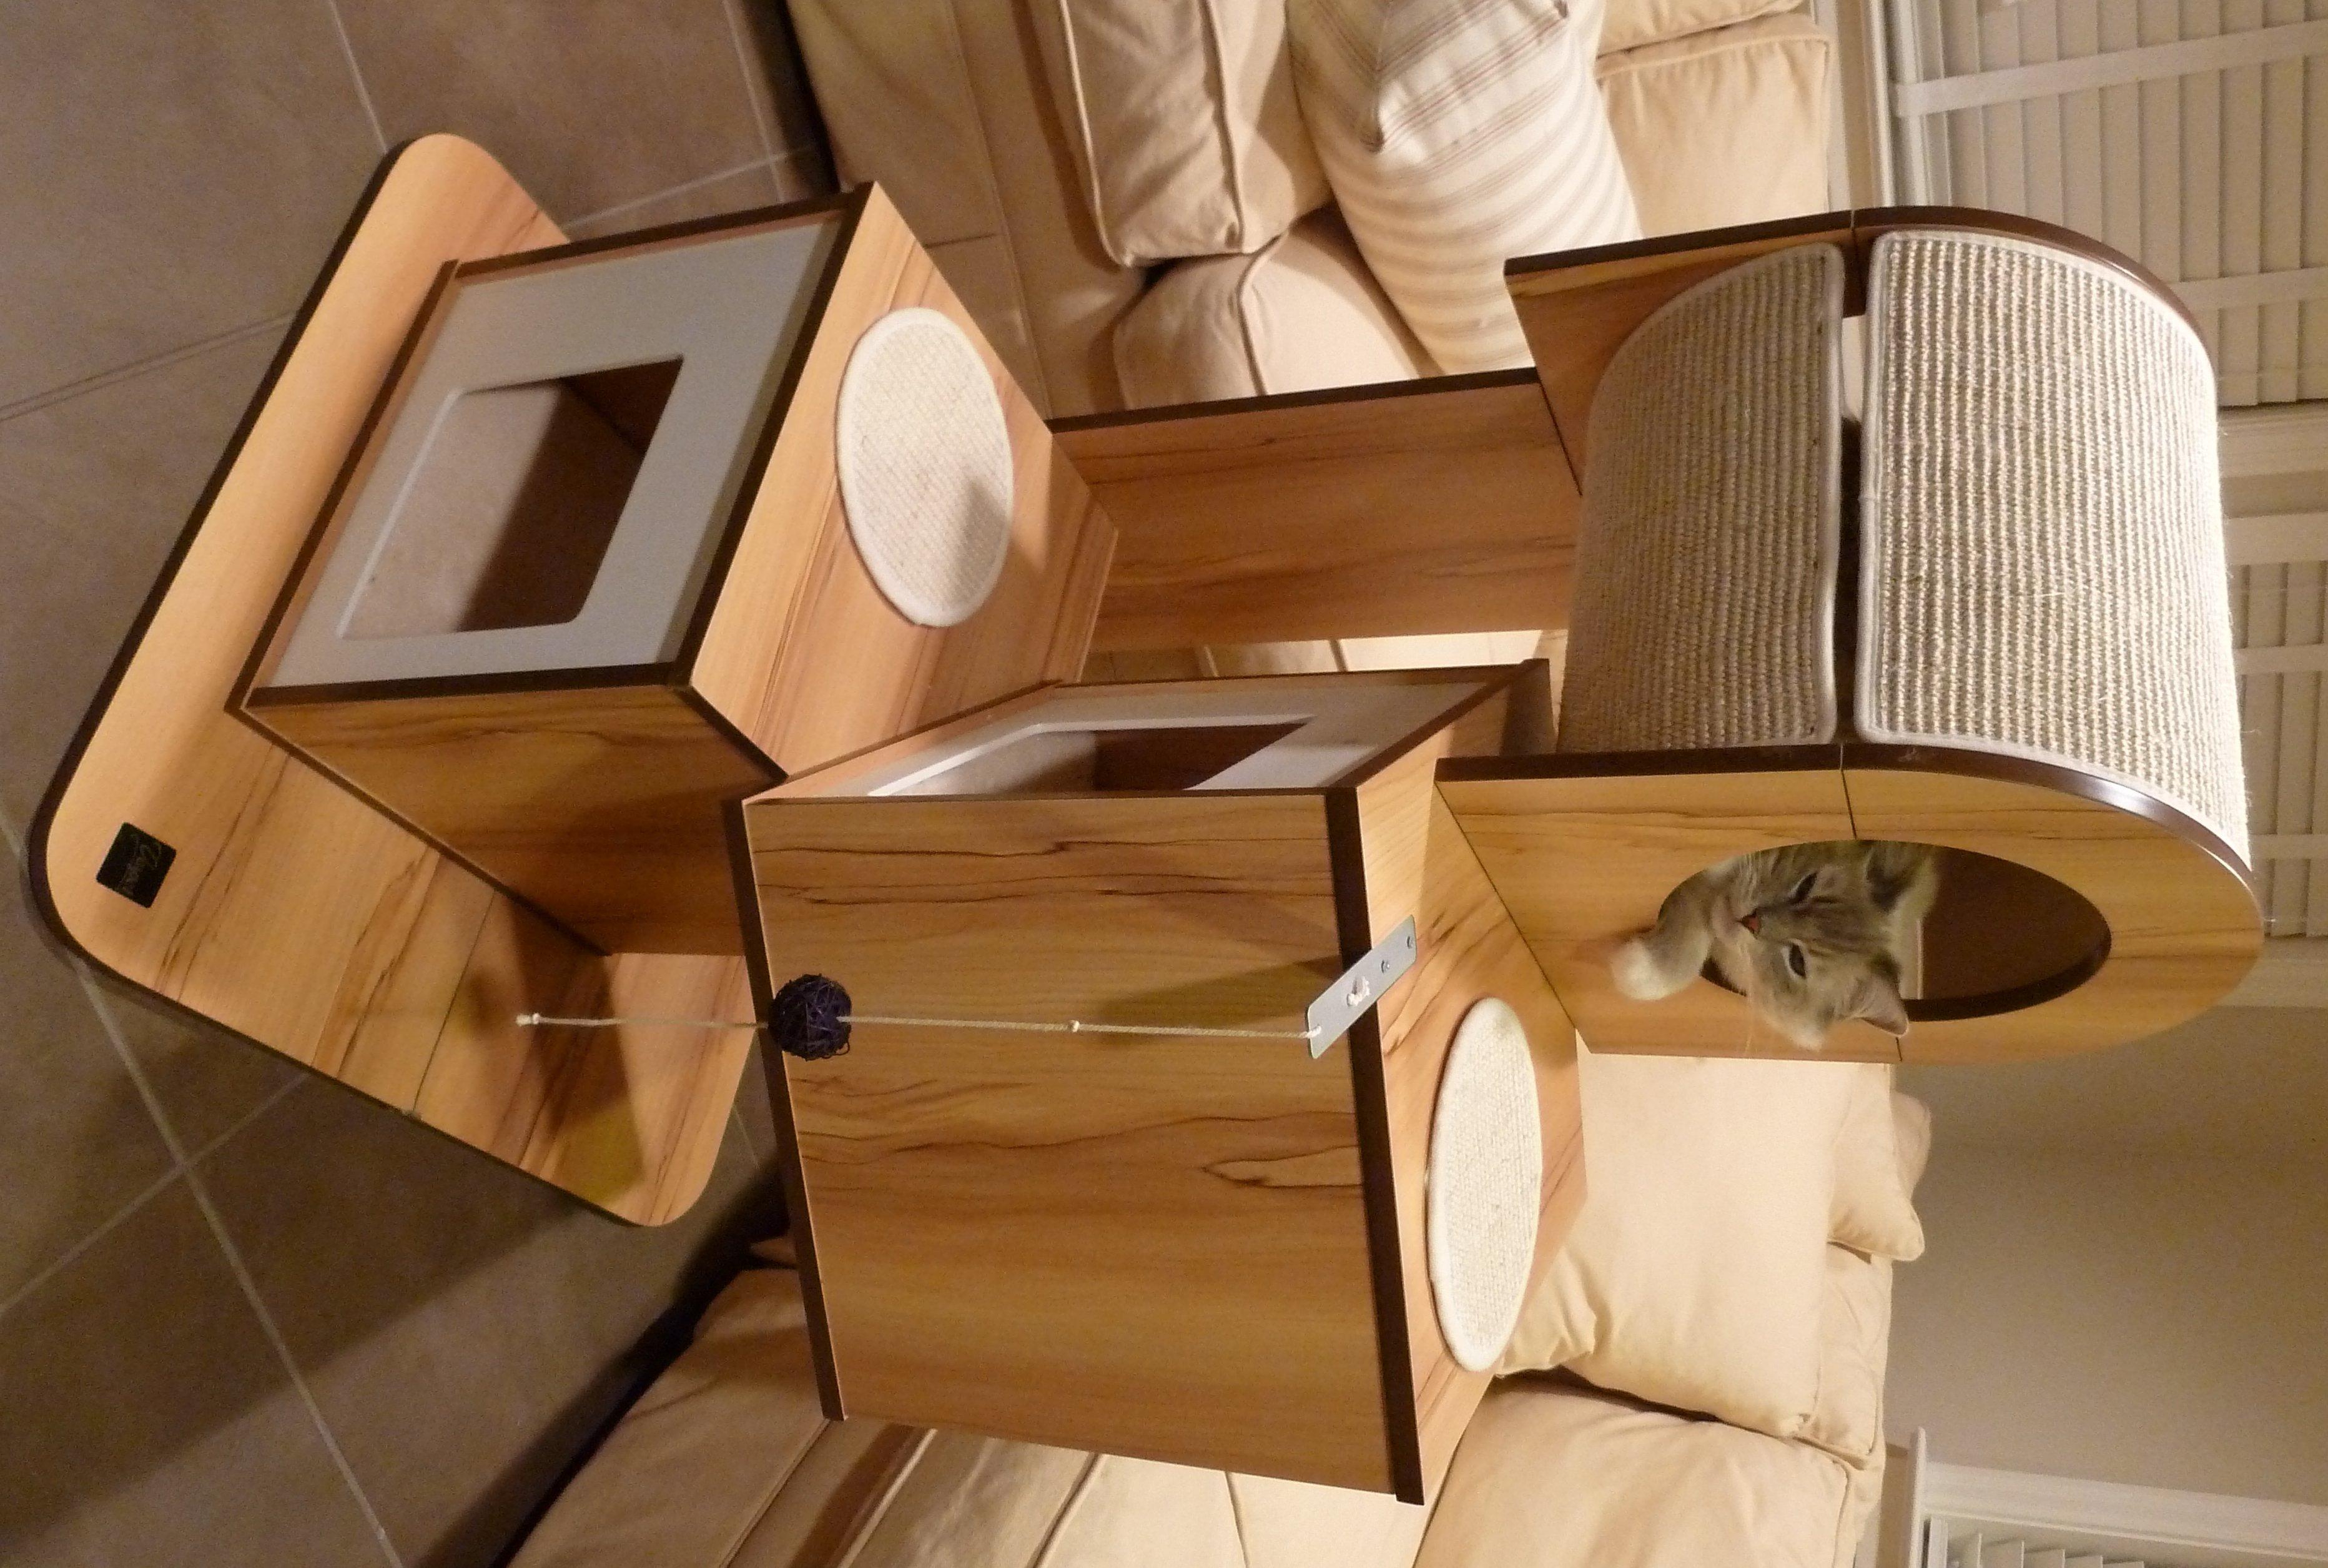 Hagen Vesper V-Tower Modern Cat Tree Furniture Product Review